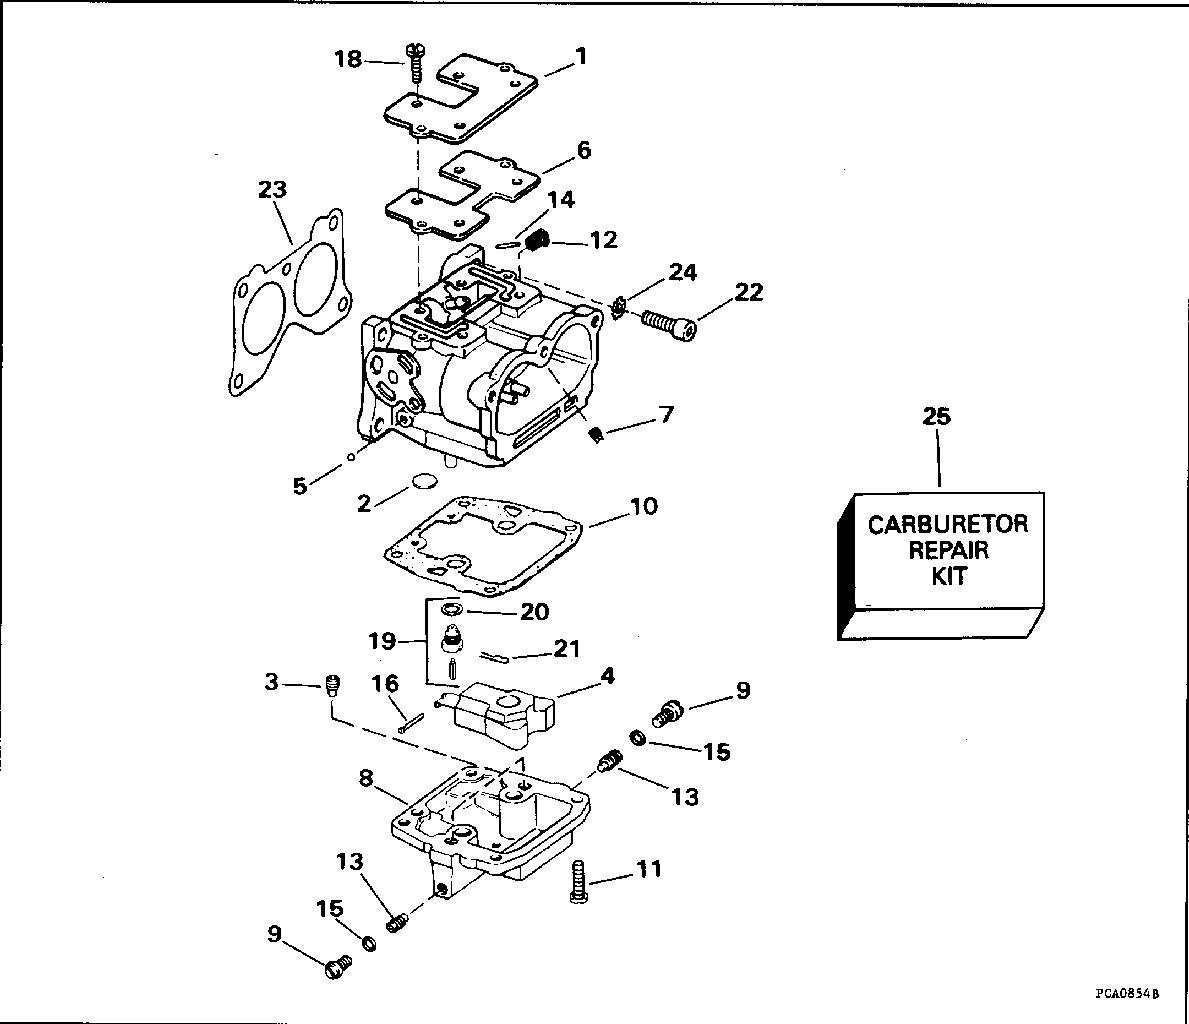 Johnson 9 9 Carburetor Diagram